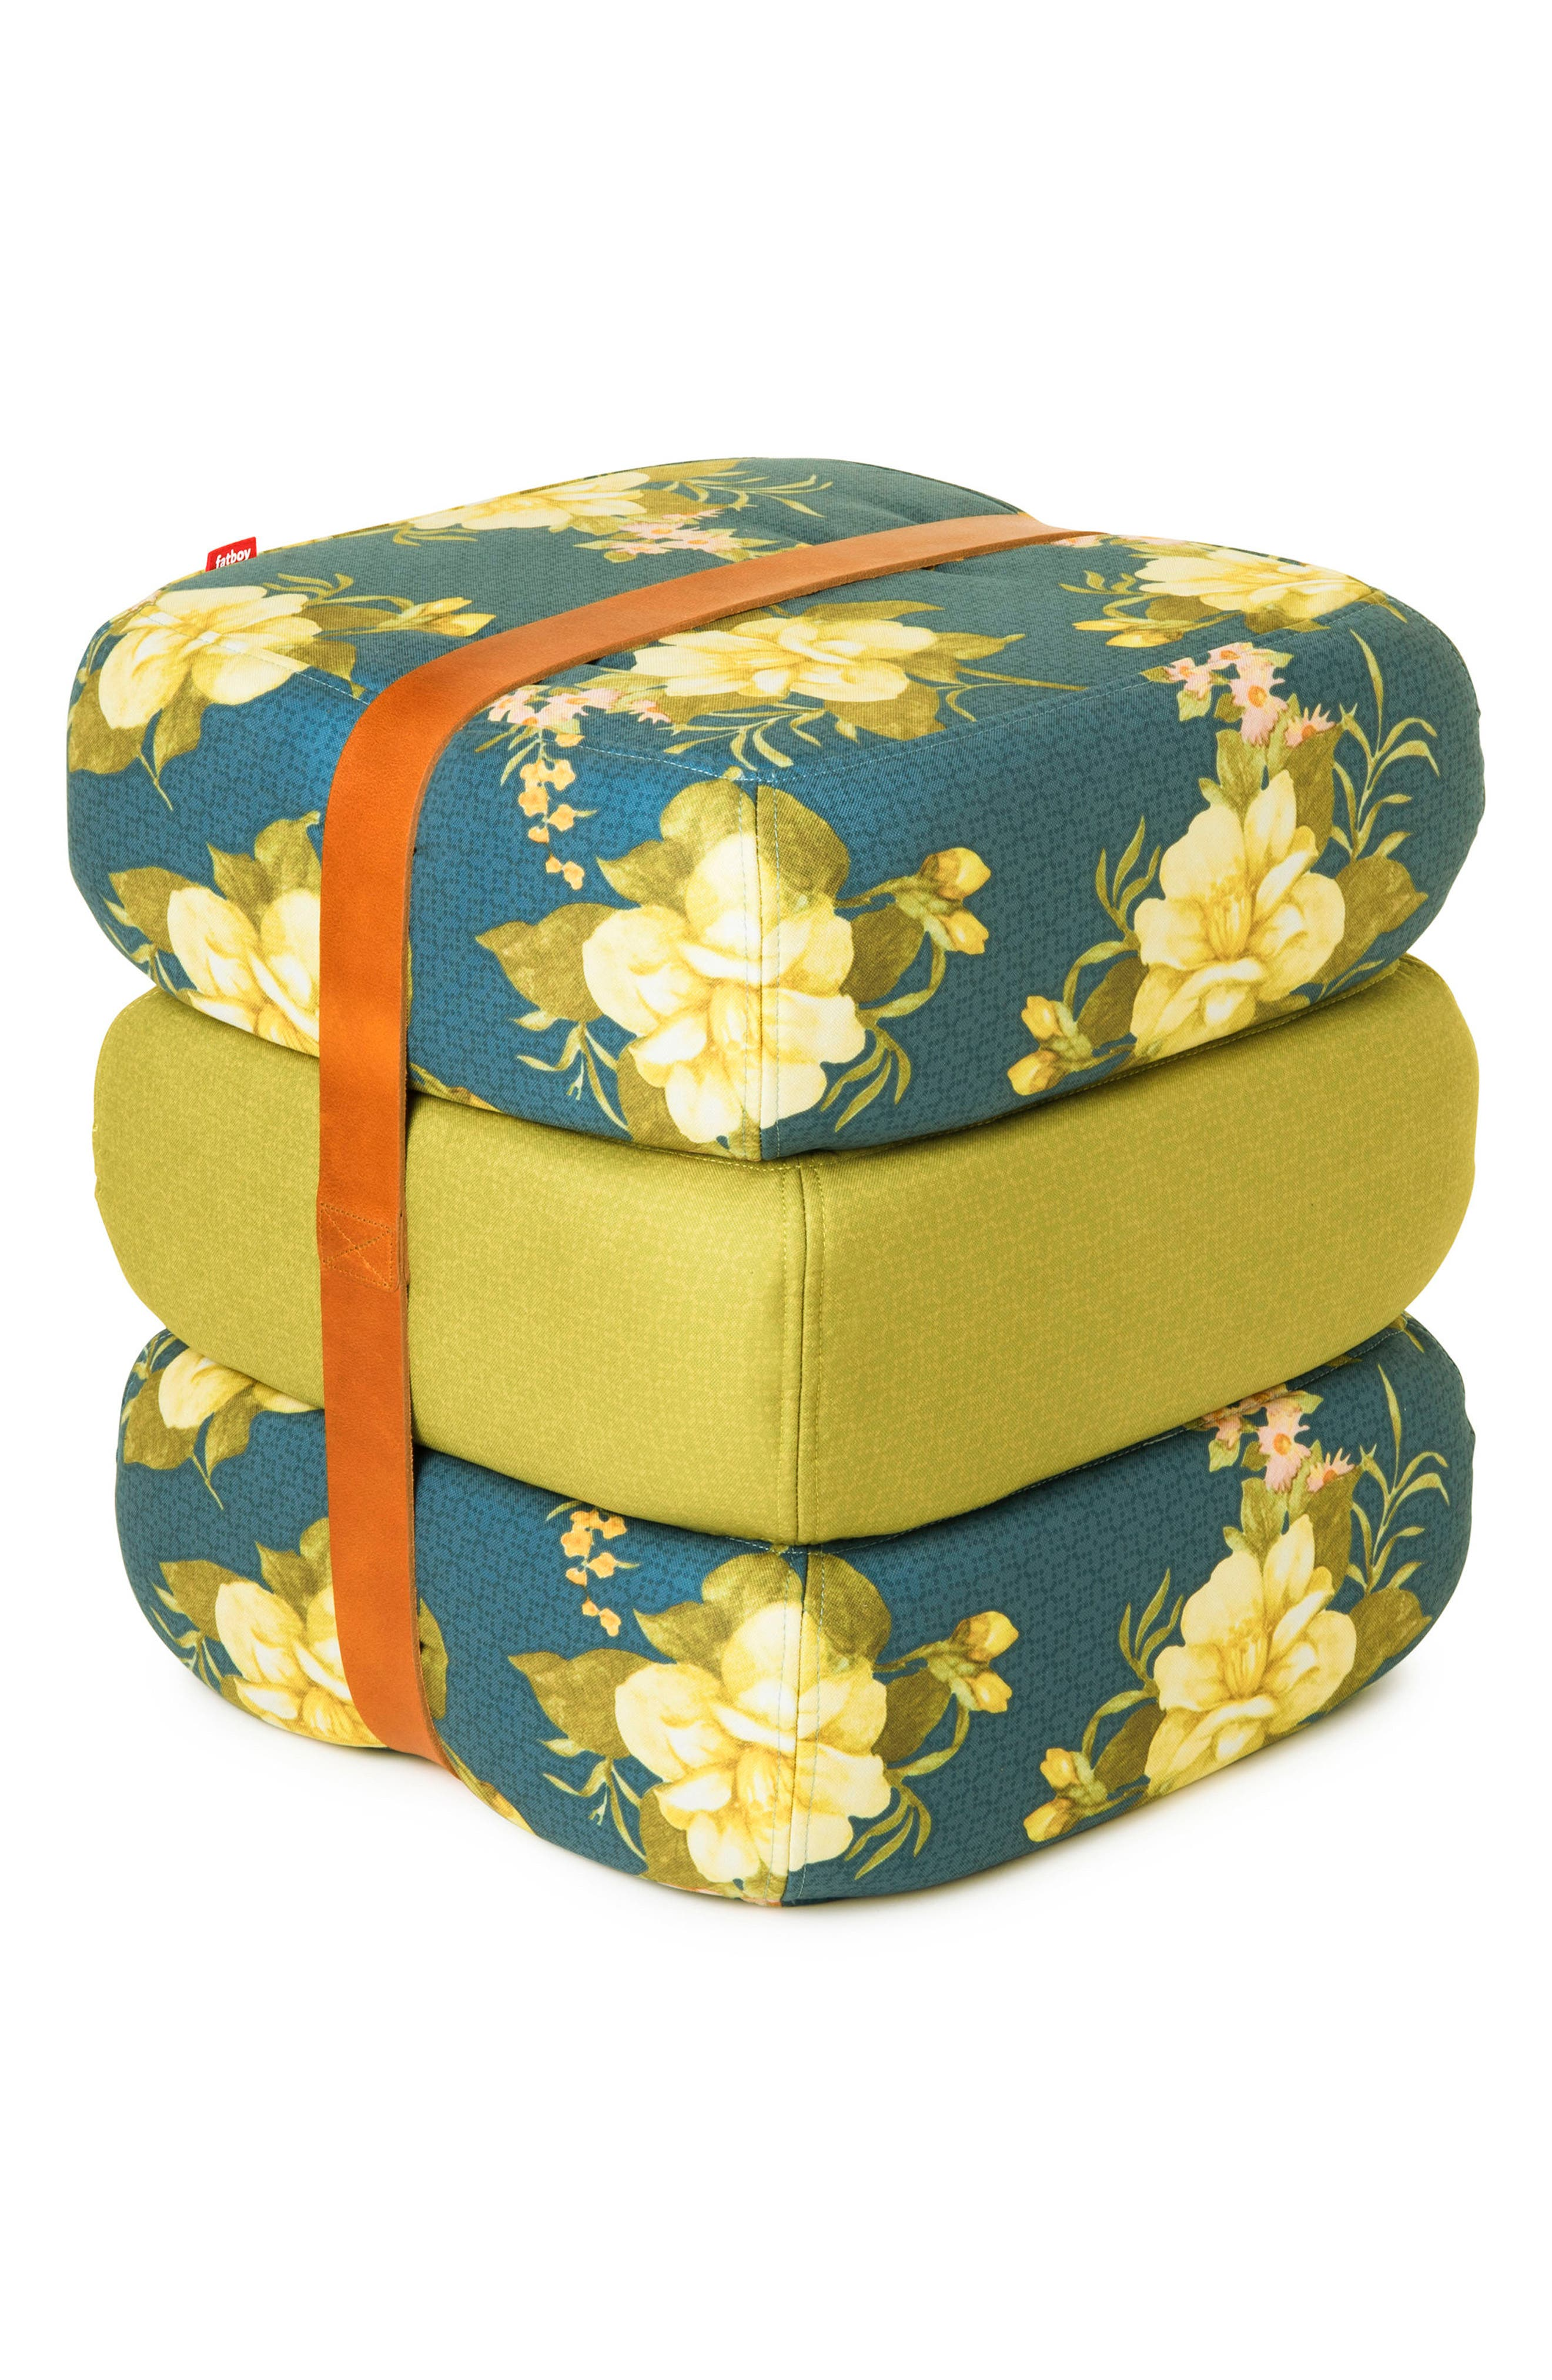 FATBOY,                             Baboesjka Set of 3 Pillows,                             Main thumbnail 1, color,                             403